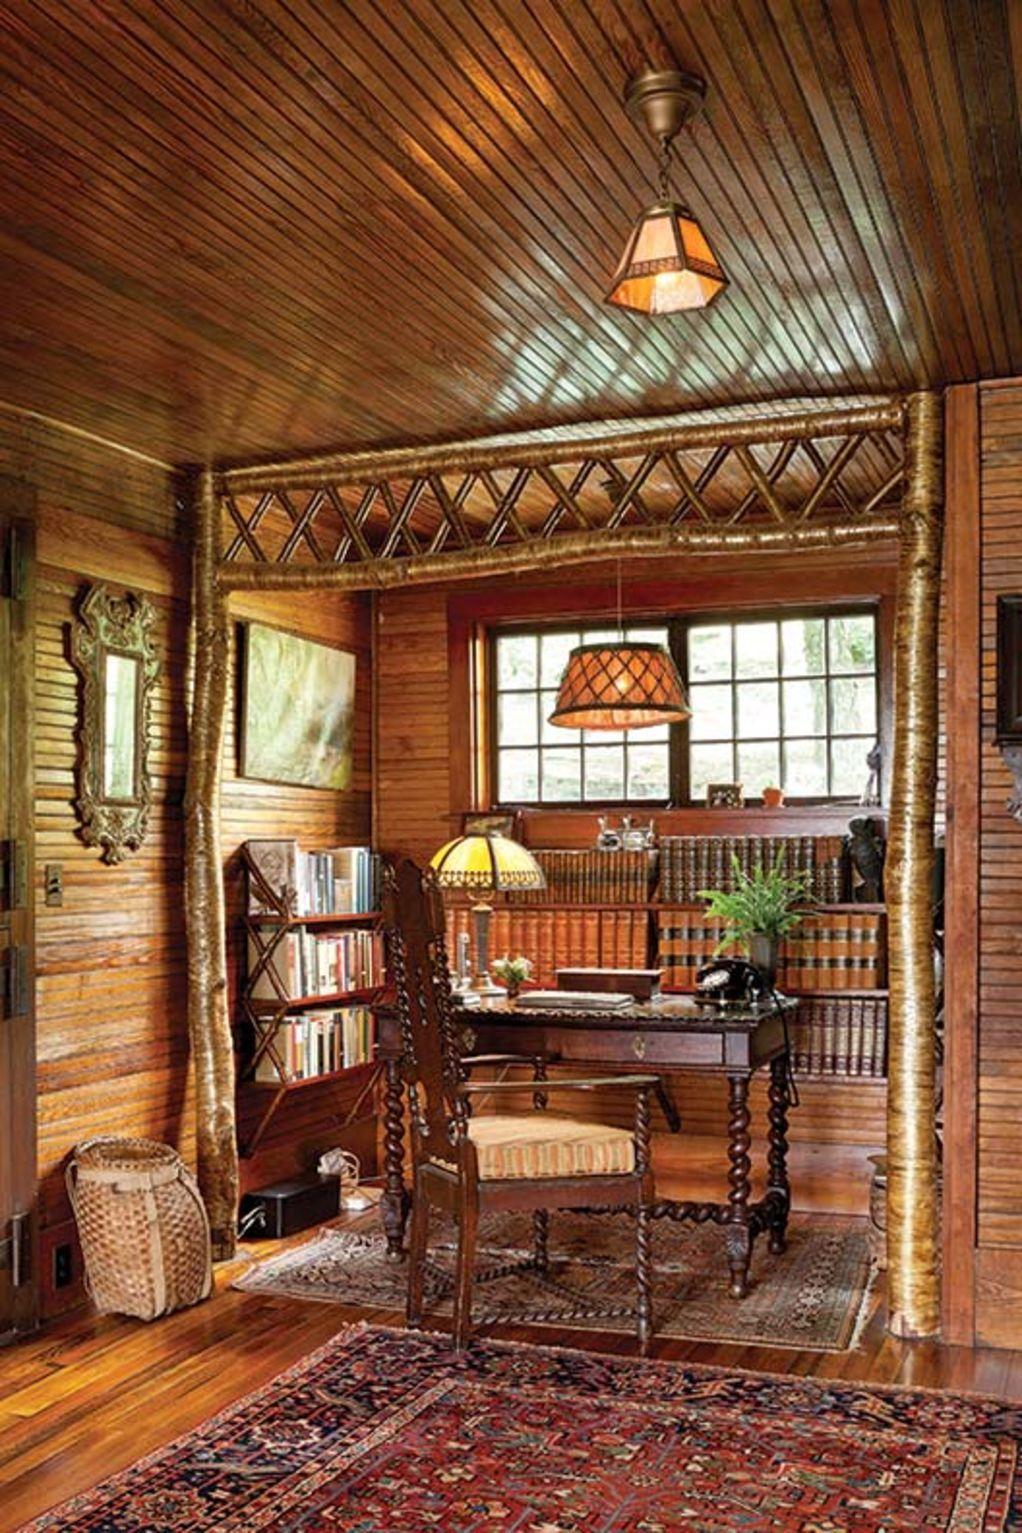 Restoring an Adirondack Camp | Cabin interiors, Cabin ...